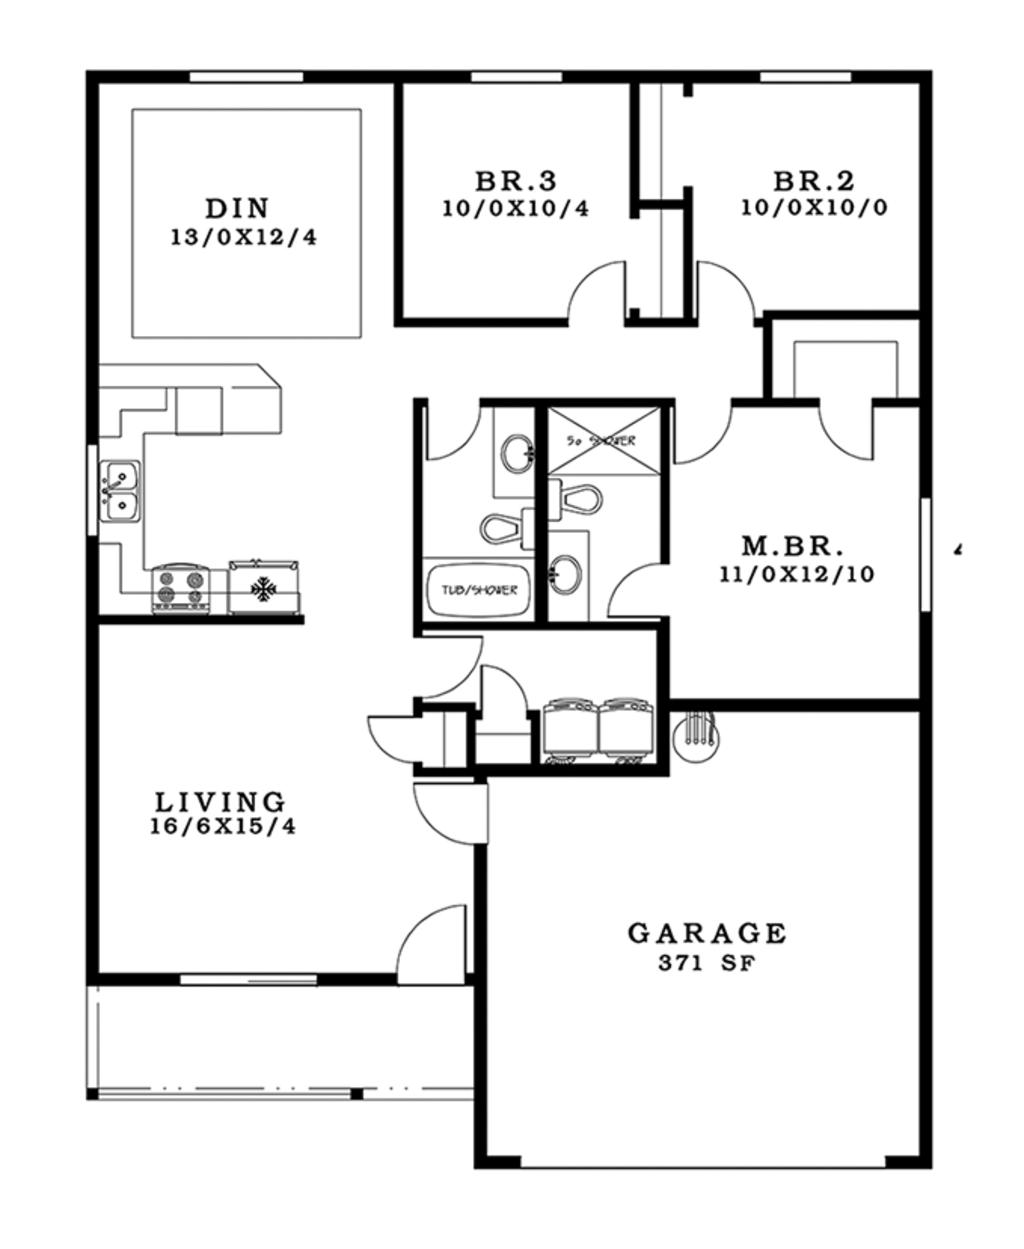 100 Square Feet Bedroom Design: Craftsman Style House Plan